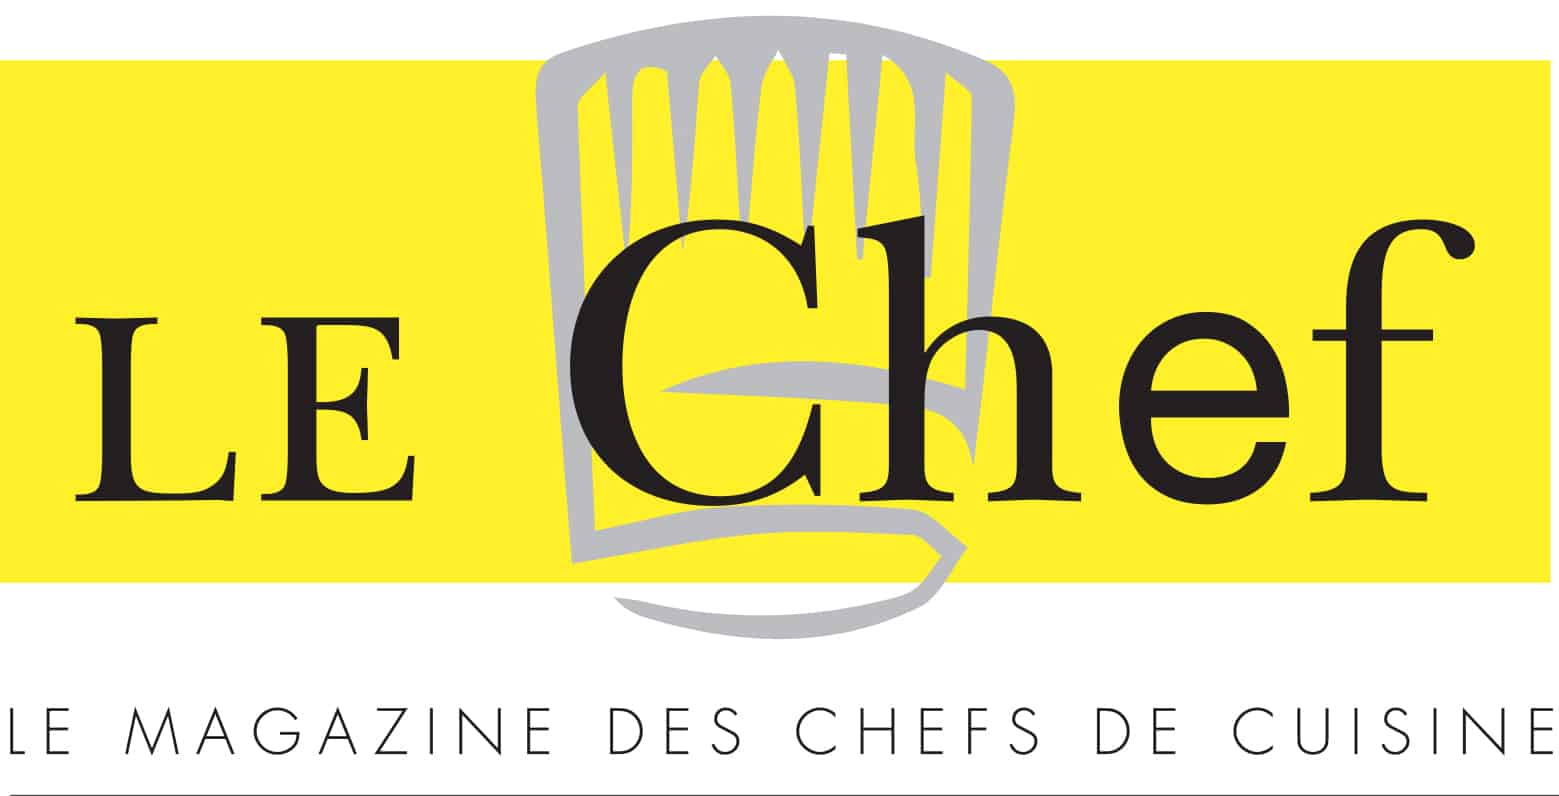 LeChef Nespresso Cannes 2017